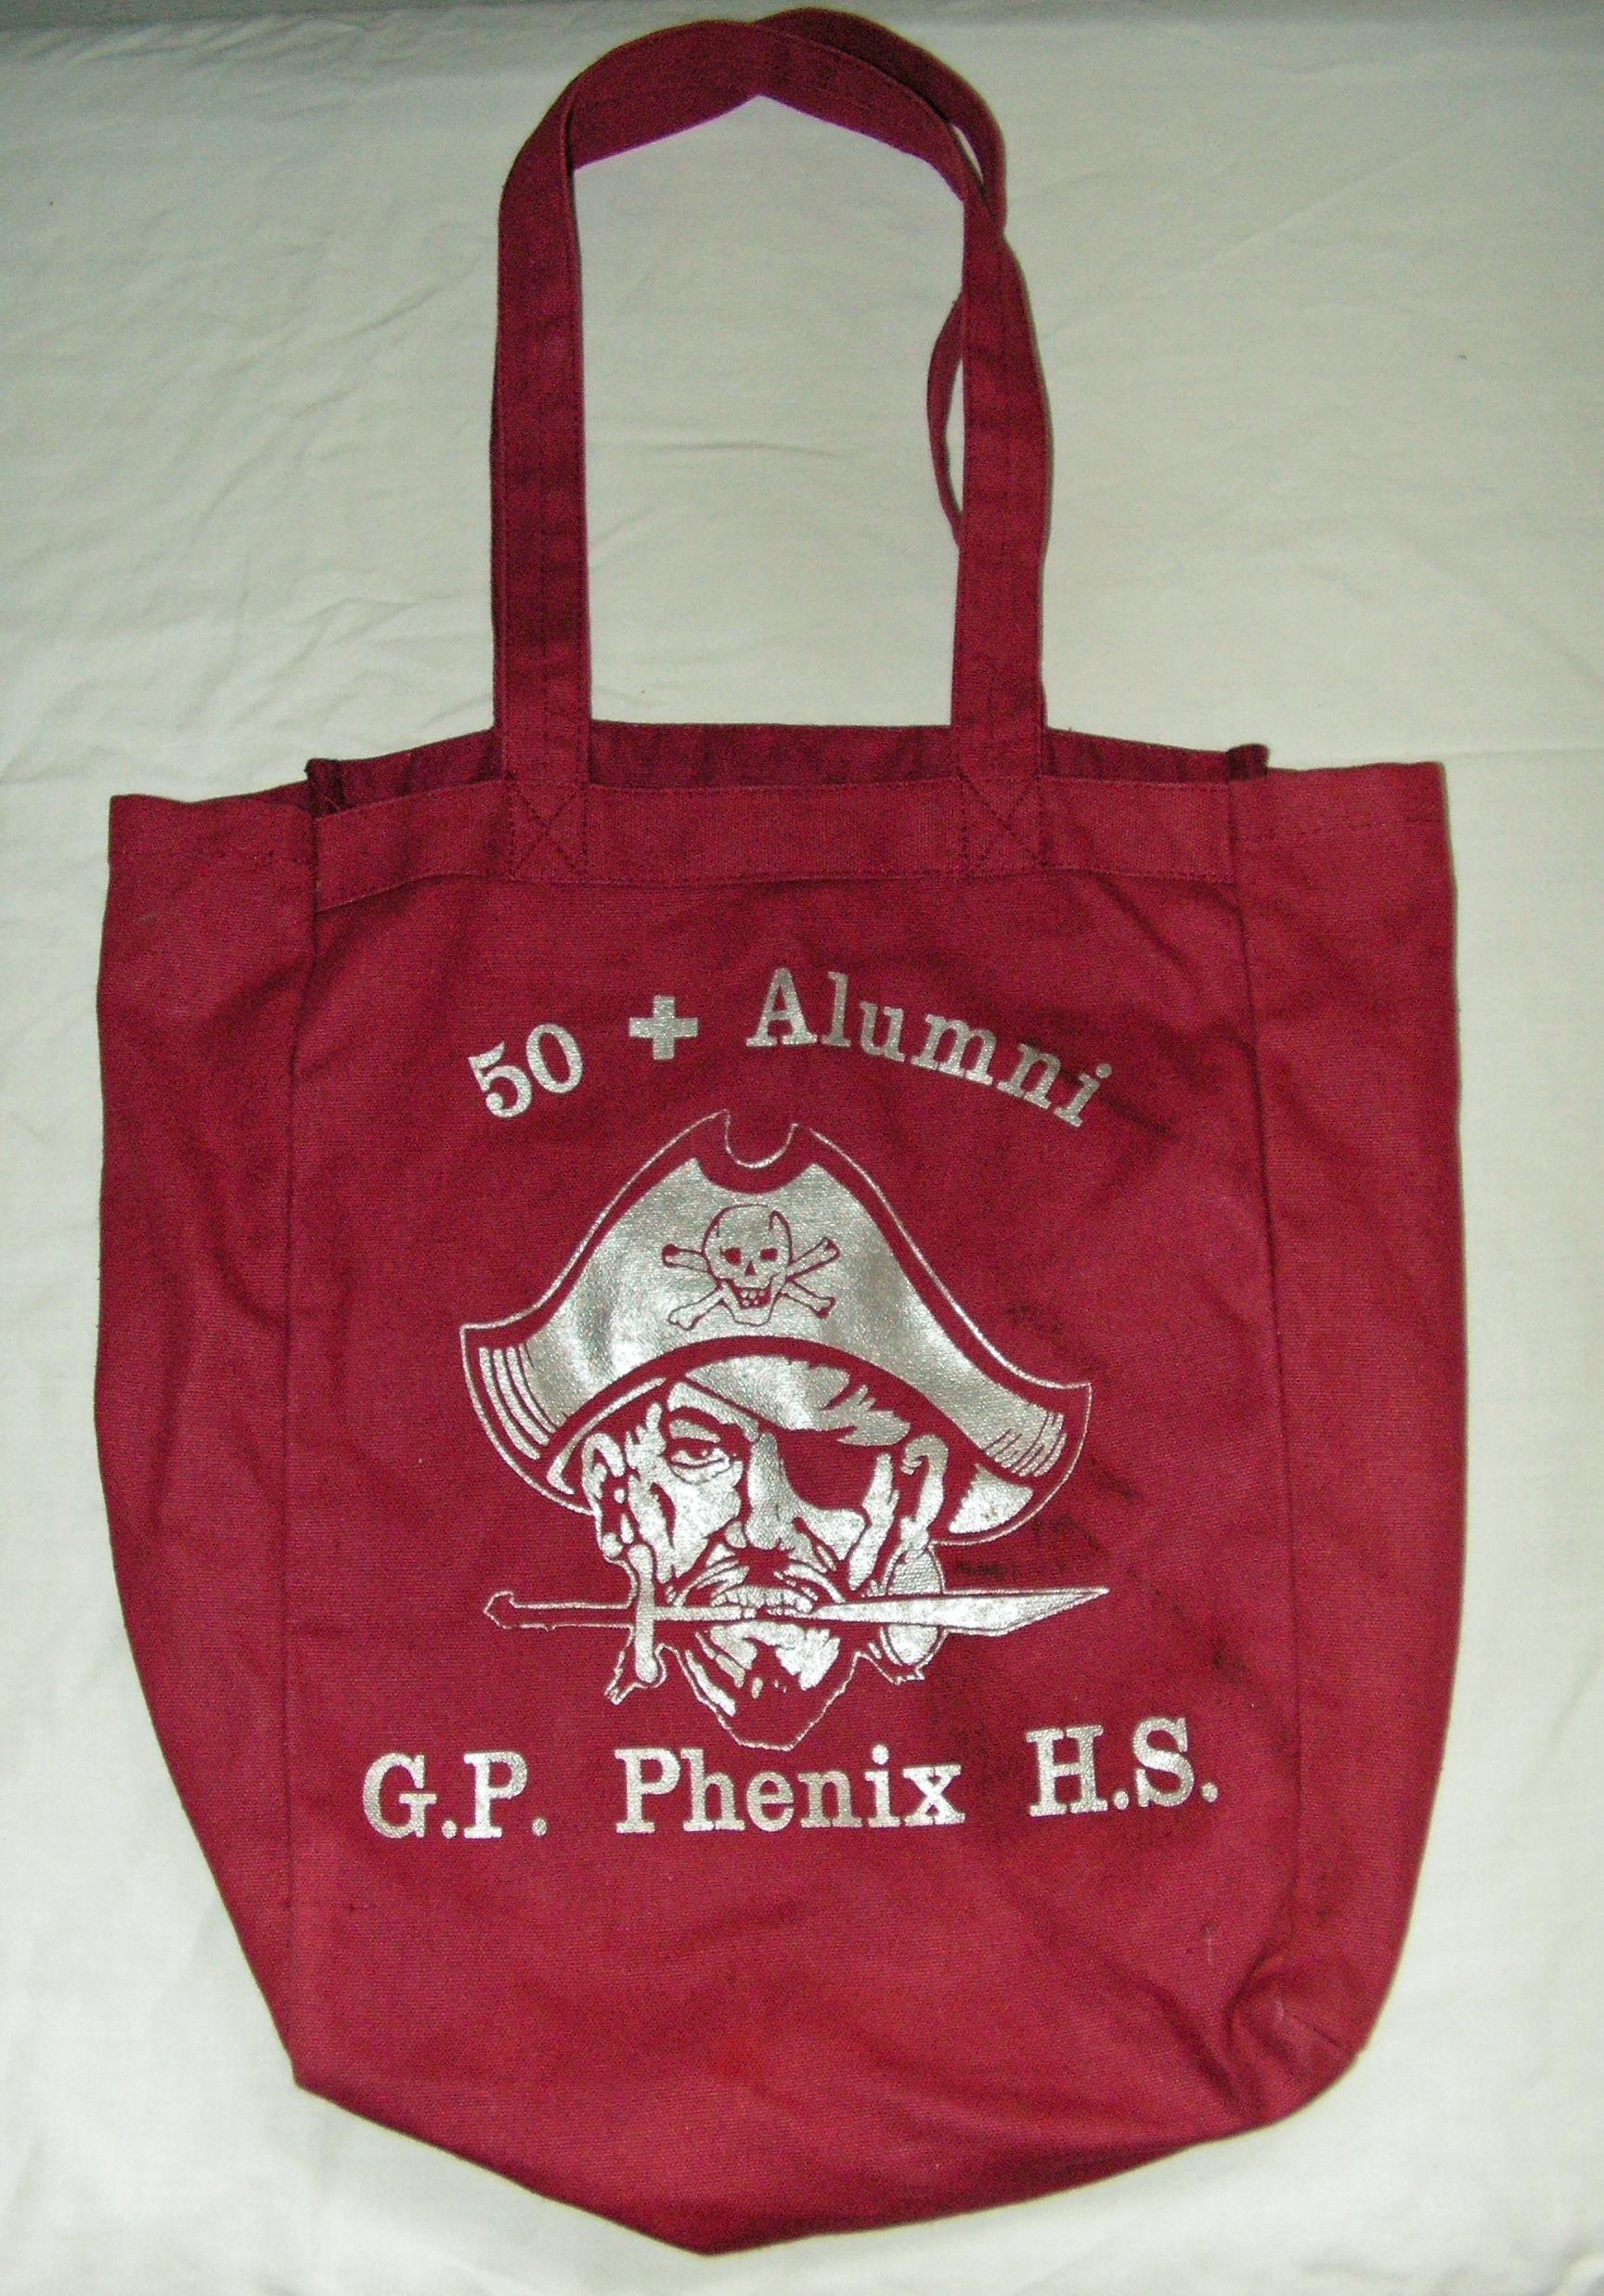 Phenix Alumni Plus 50 Group